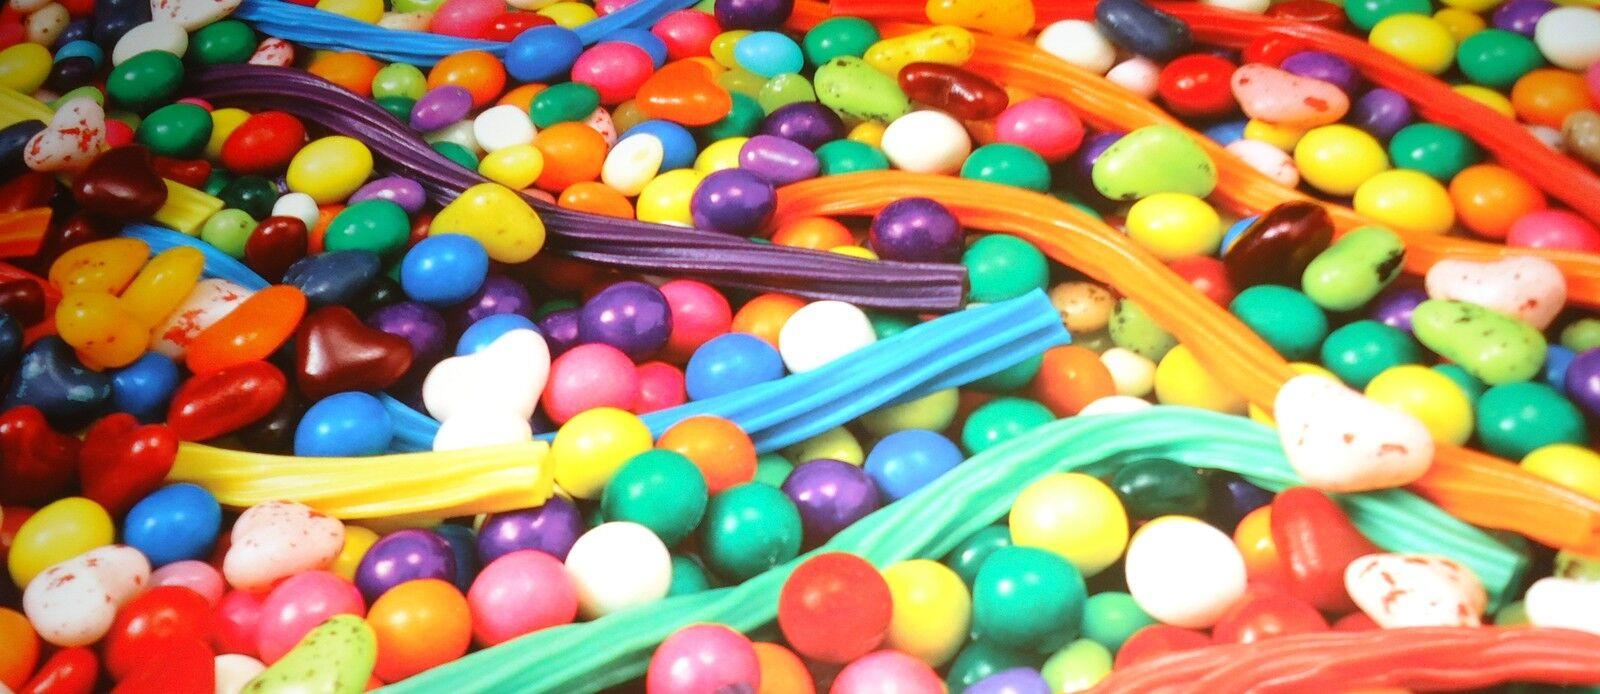 Jellybeans Closet 4 U